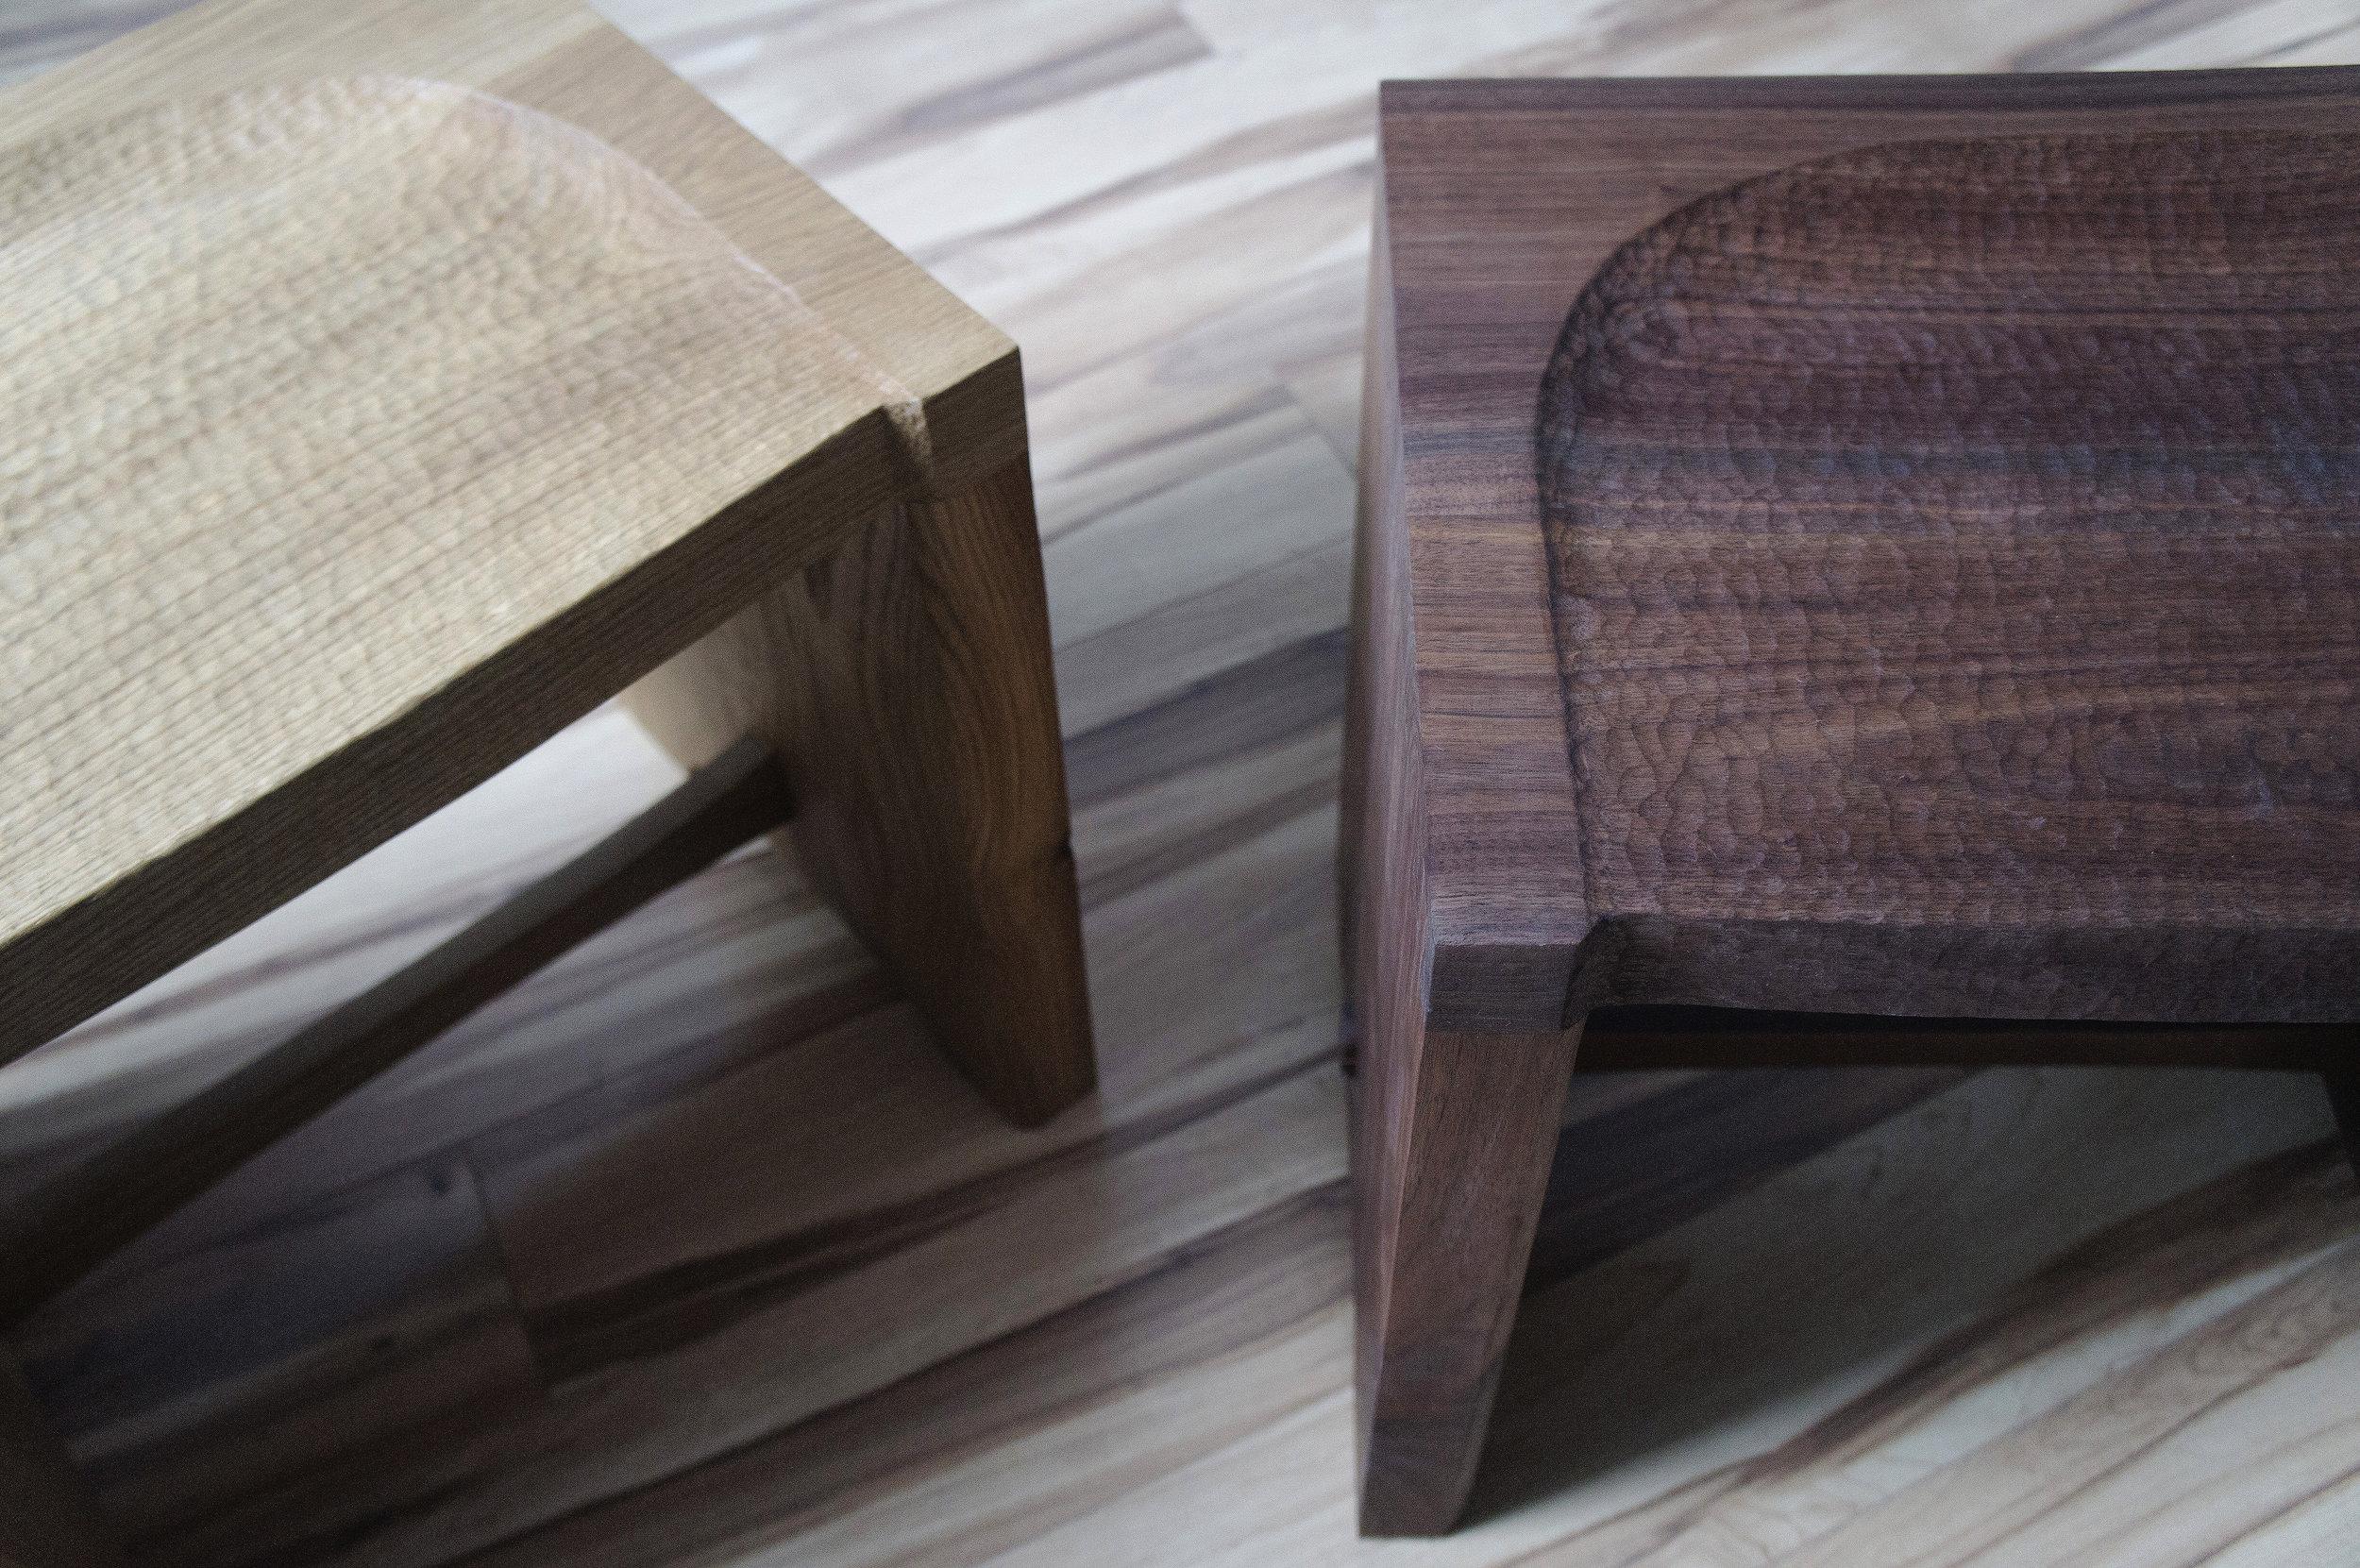 Mizu stools_SONY NEX_photos for website_mizu stool oak and walnut top angle close up.jpg